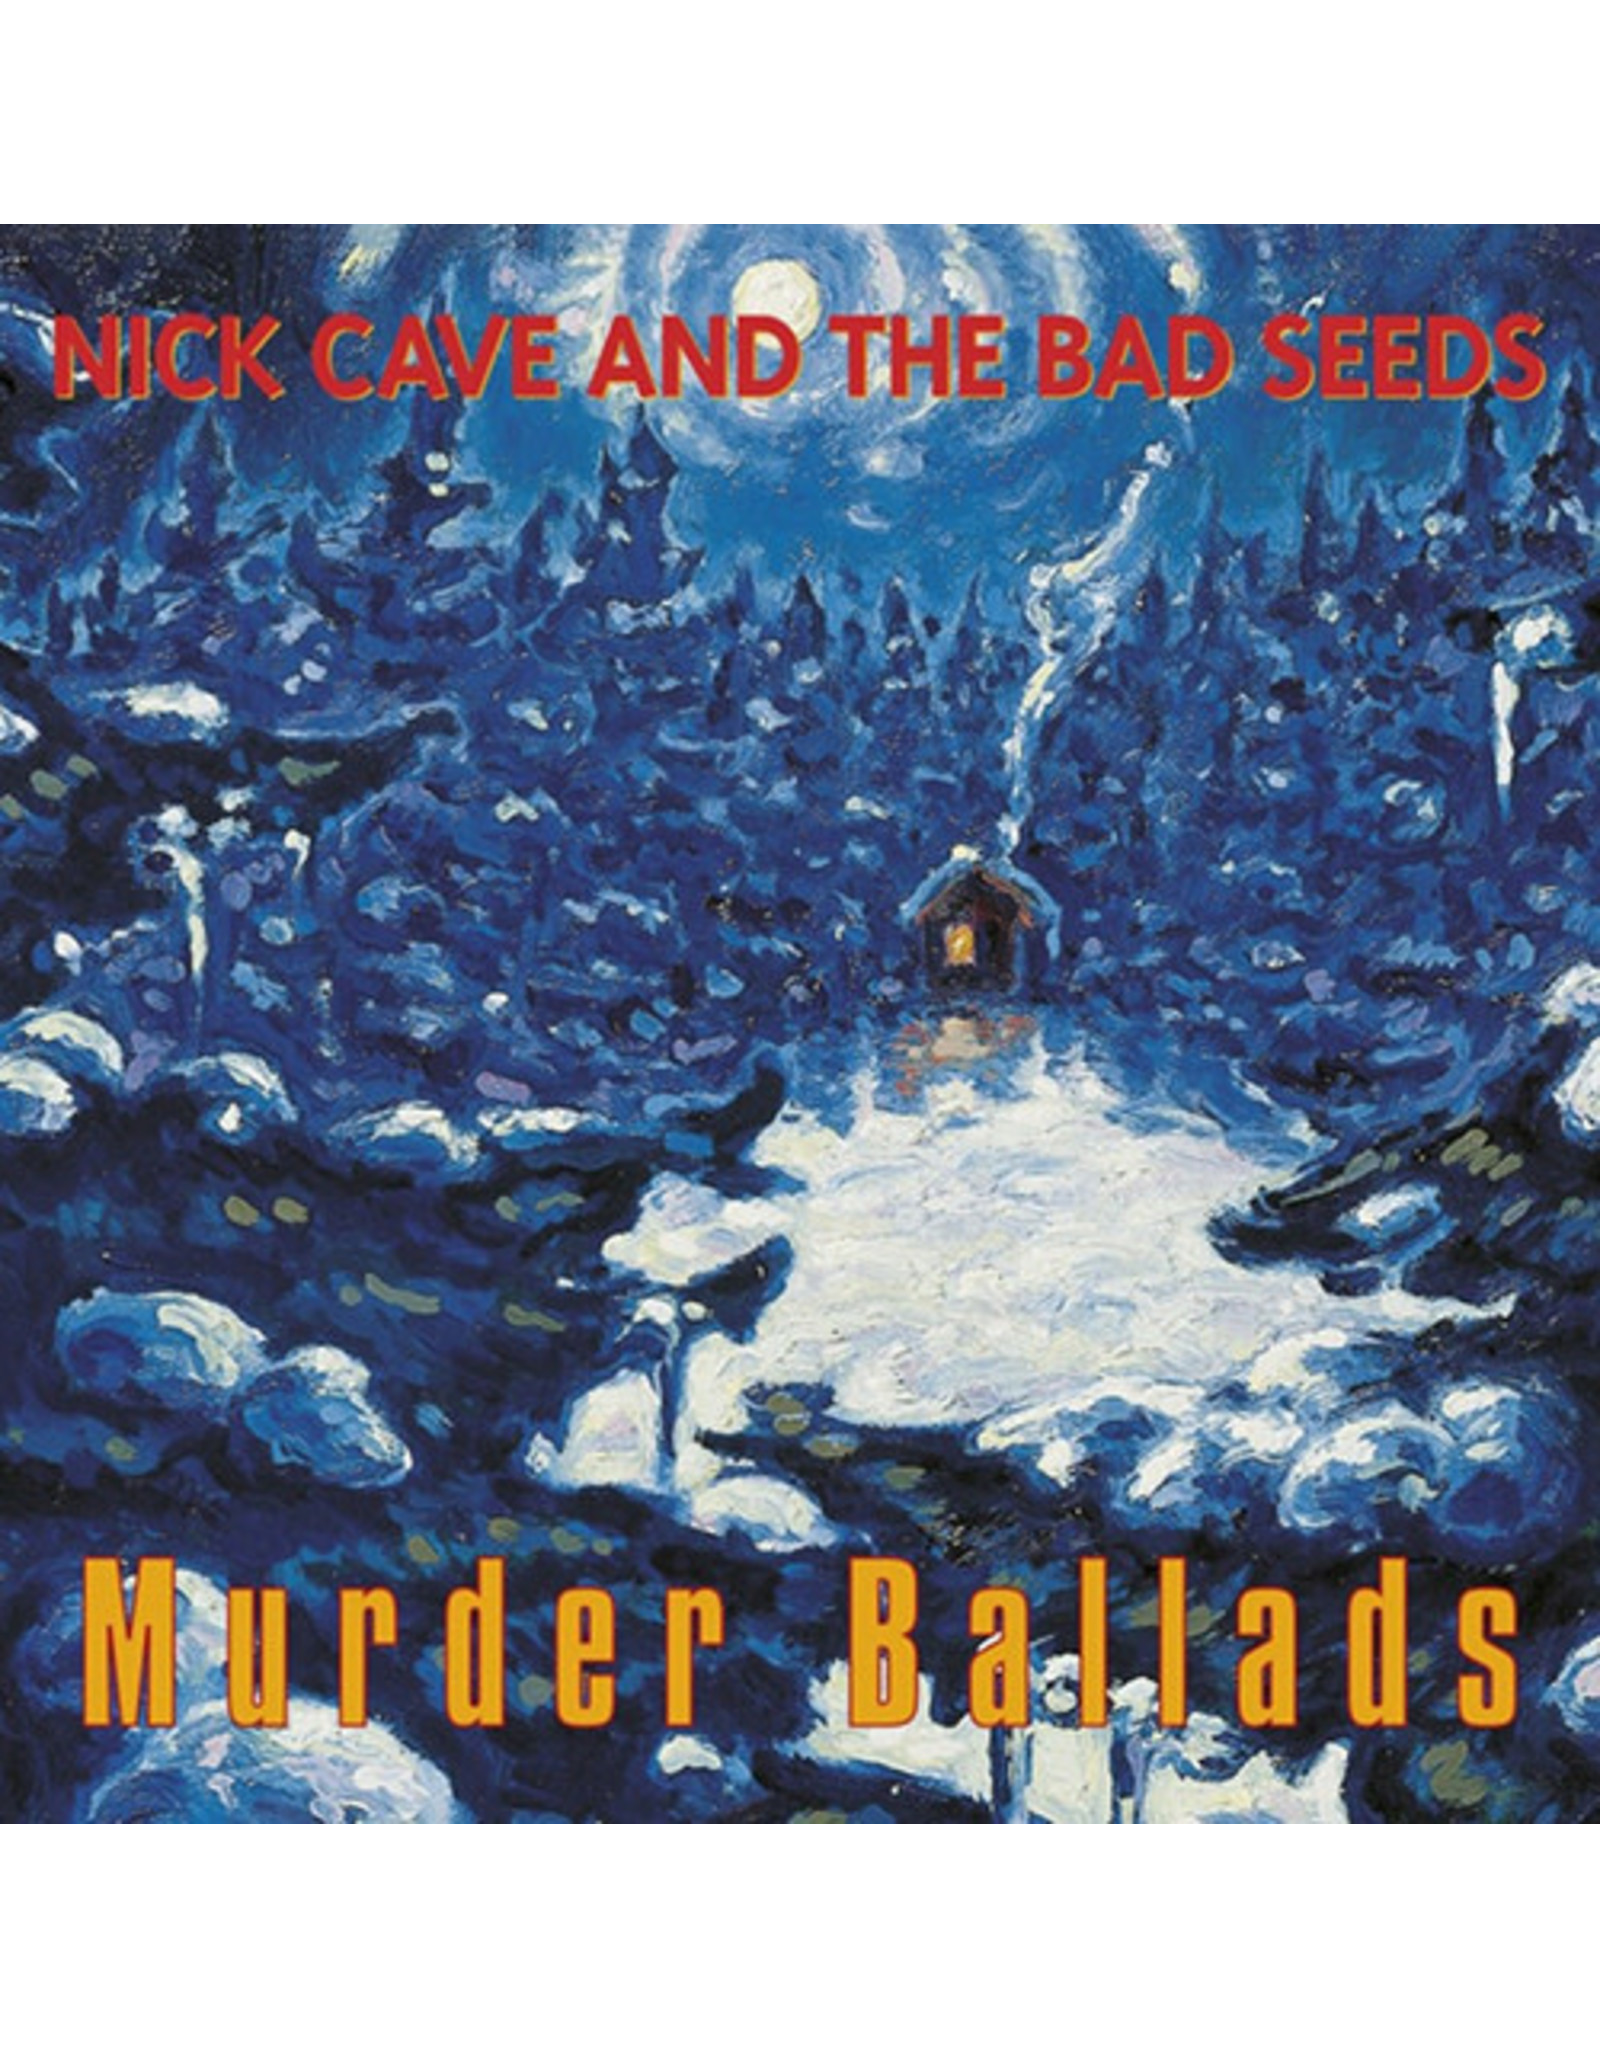 Mute Cave, Nick & The Bad Seeds: Murder Ballads LP